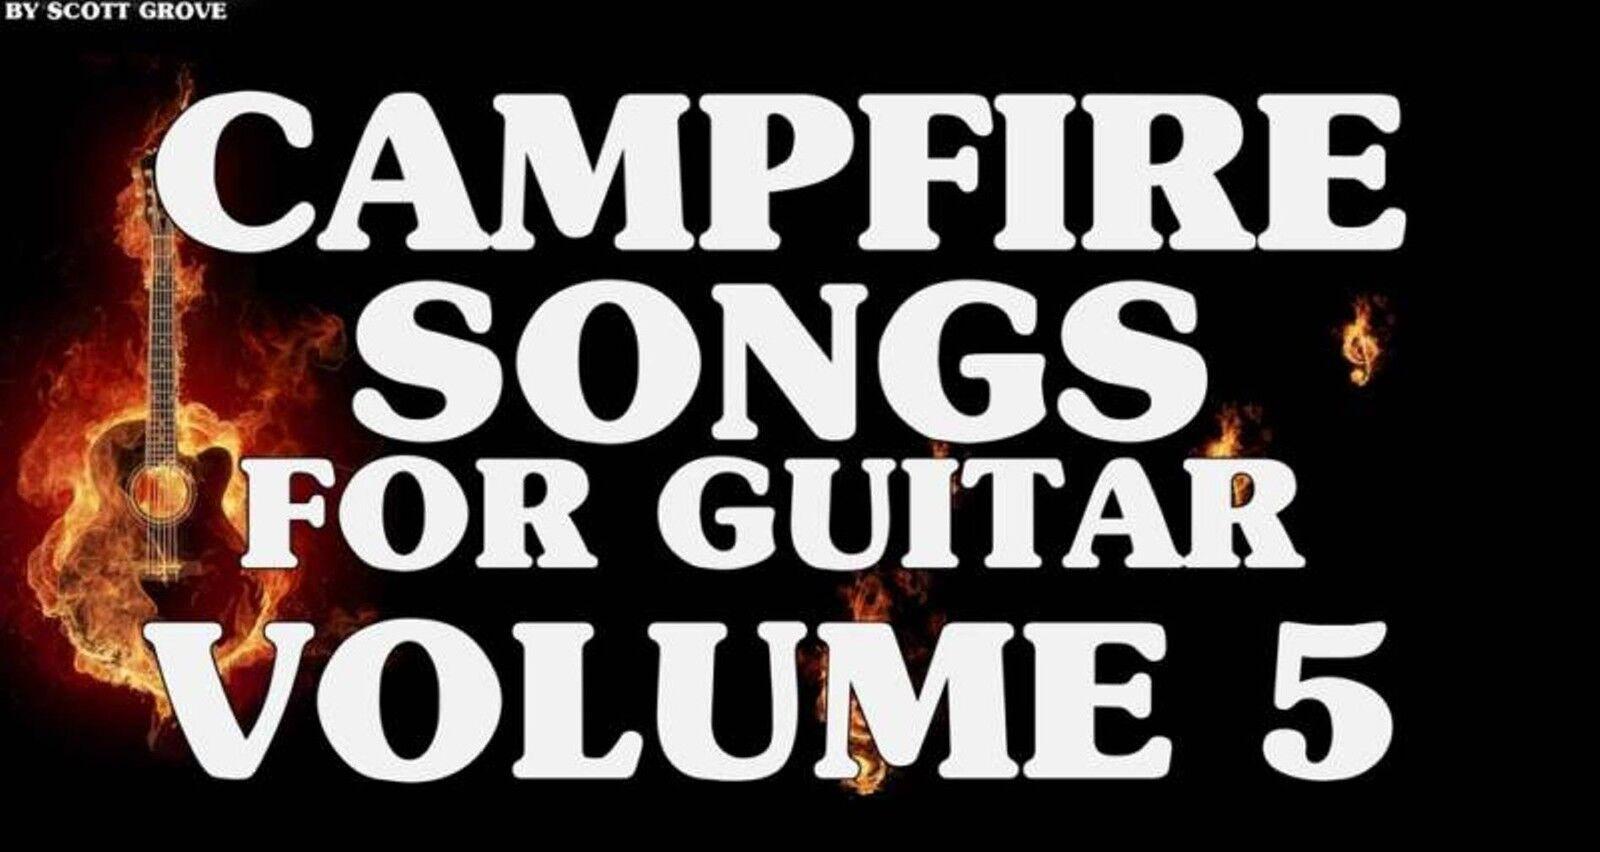 Campfire Songs For Guitar Volume 5 Dvd Lessons Jimmy Buffett Ccr